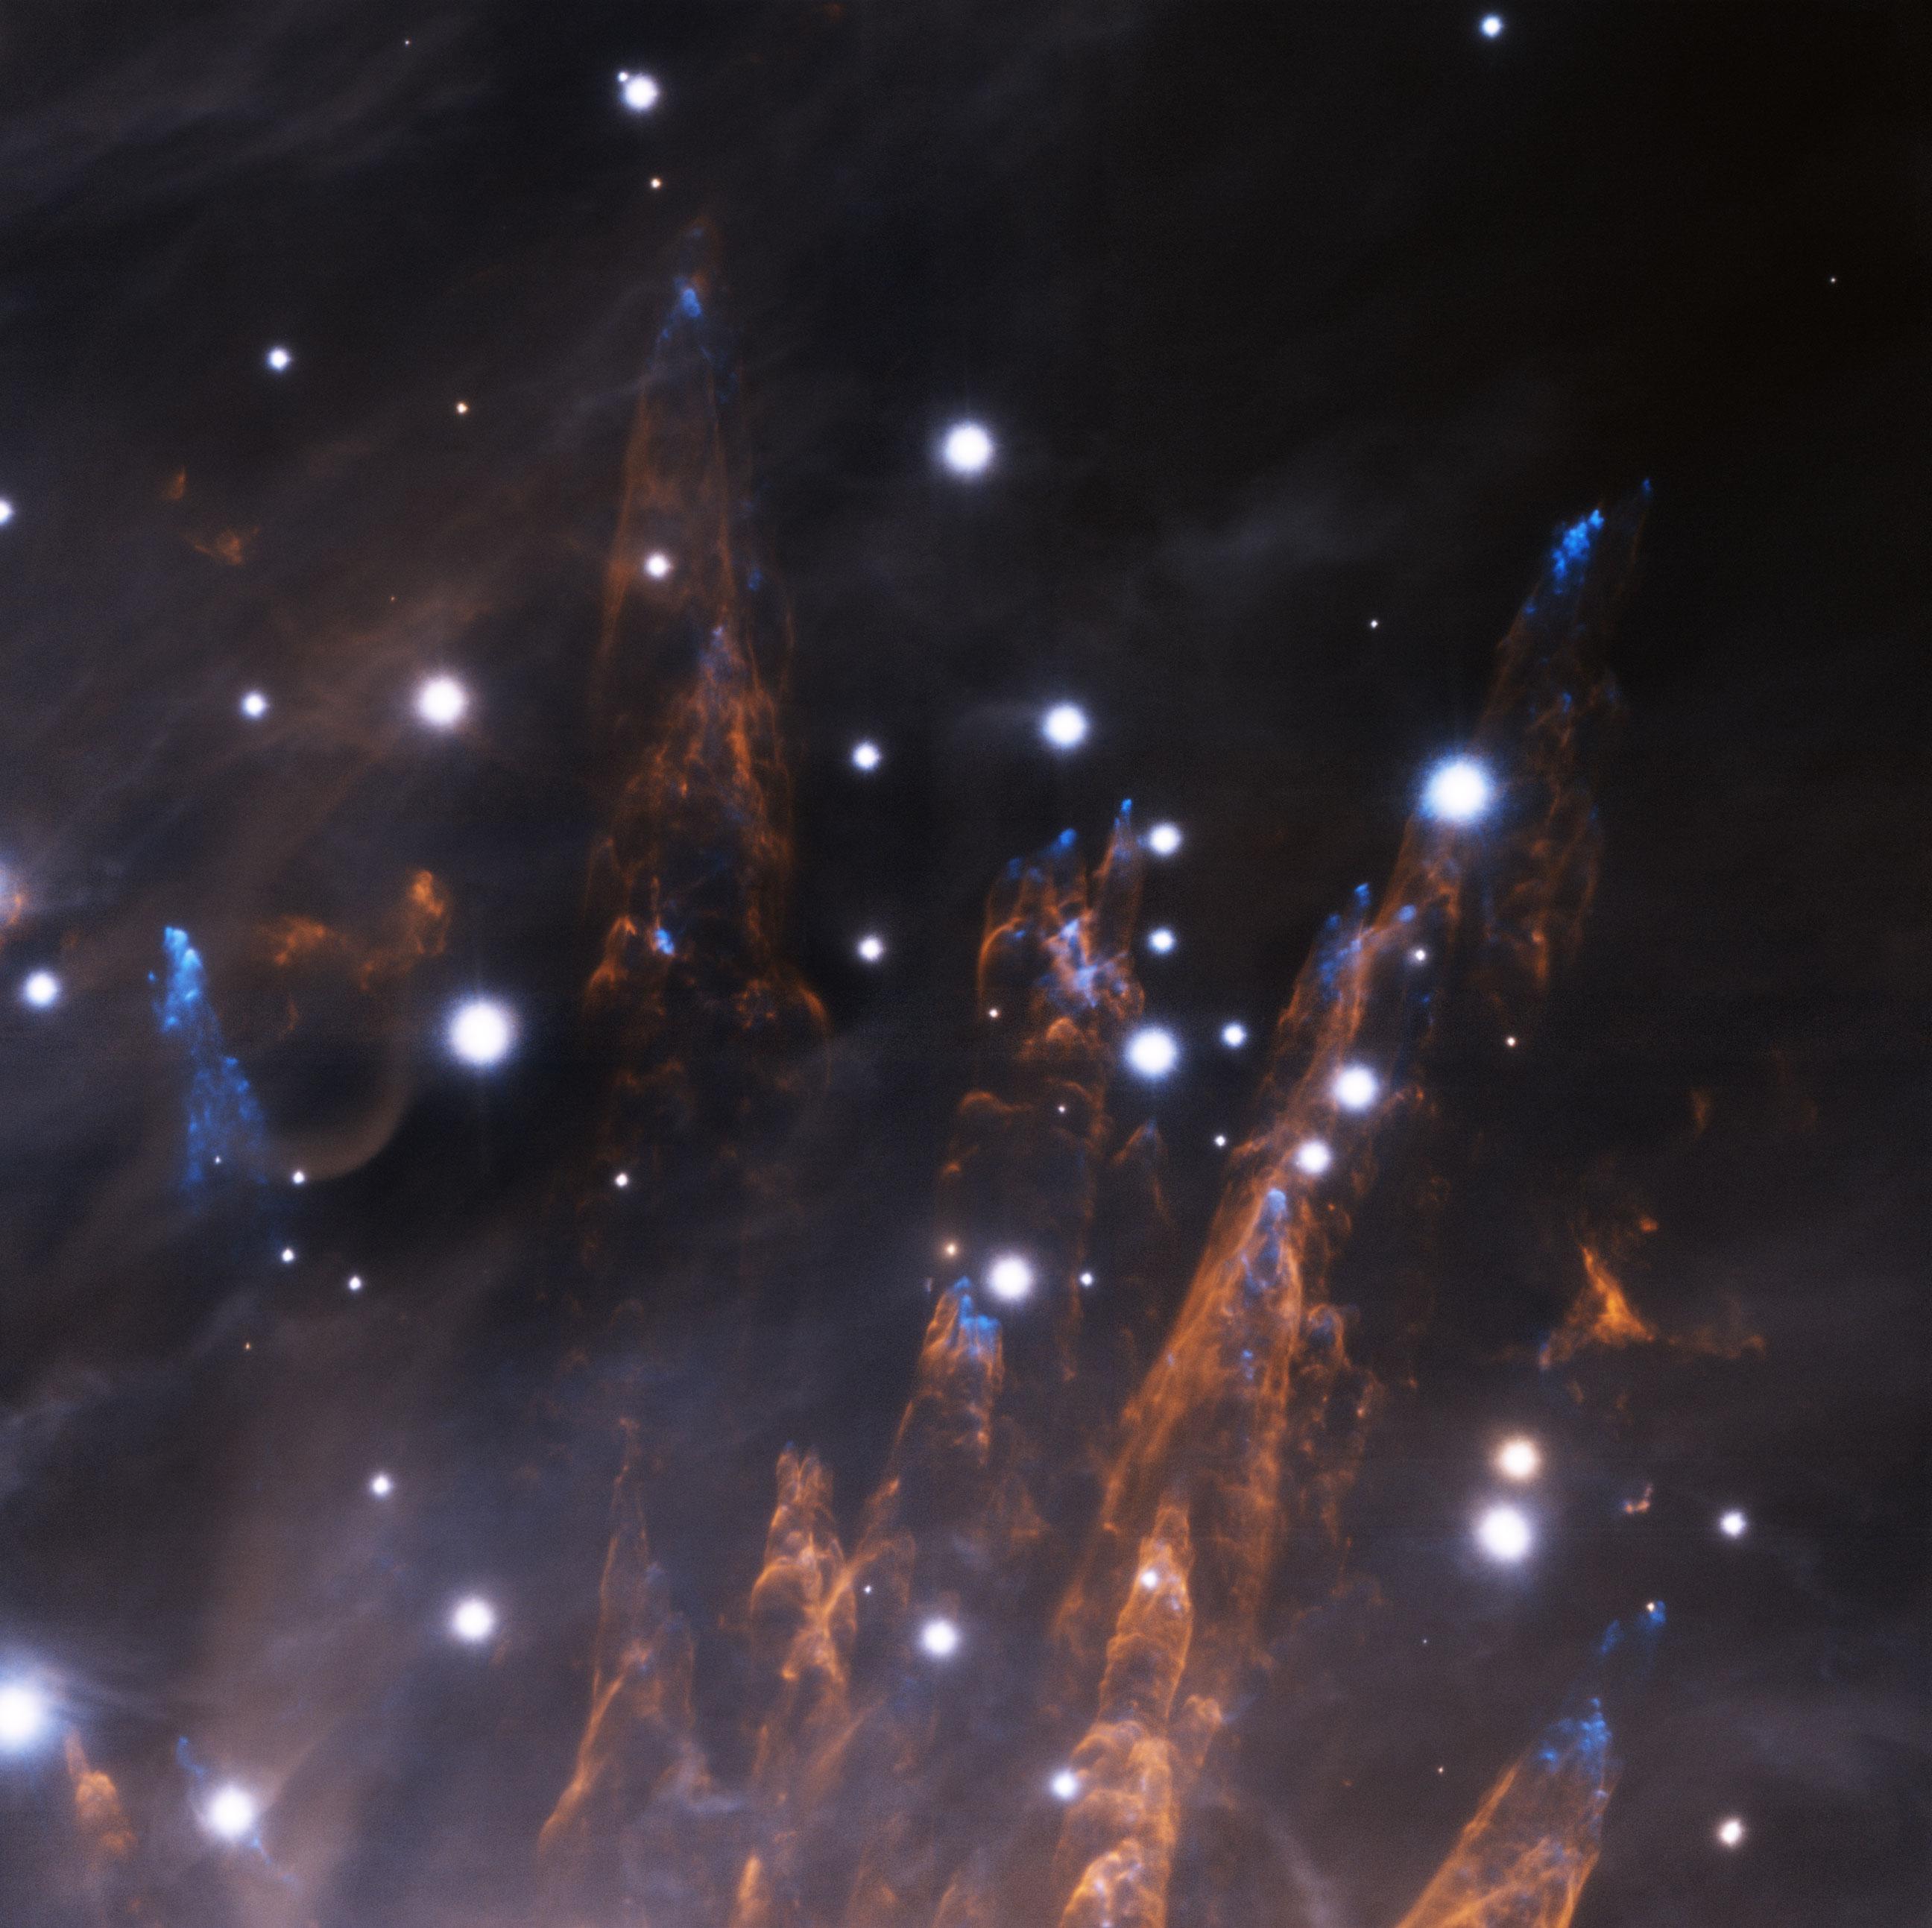 Kulkos ir burbulai Oriono ūke. © Gemini Observatory/AURA